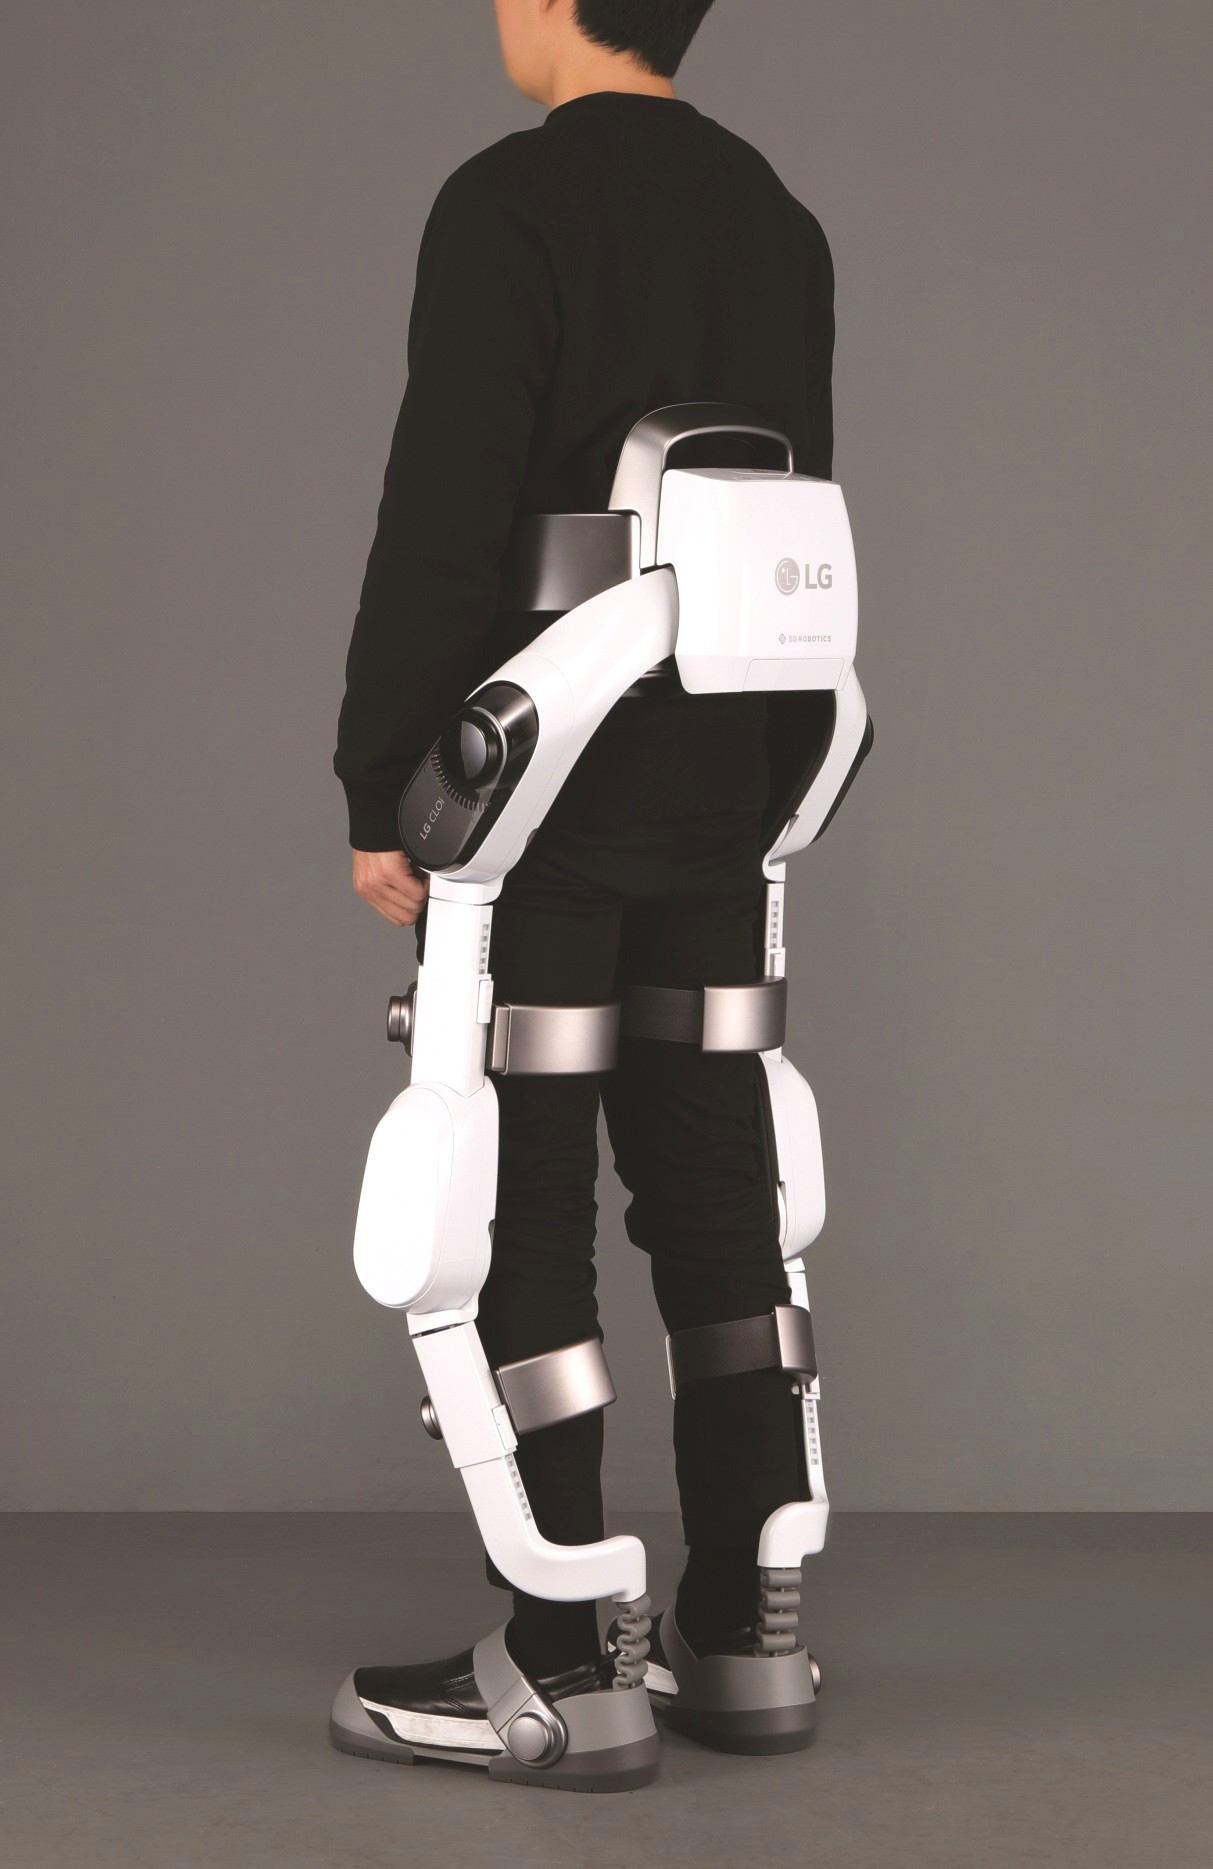 Rear view of man wearing LG CLOi SuitBot